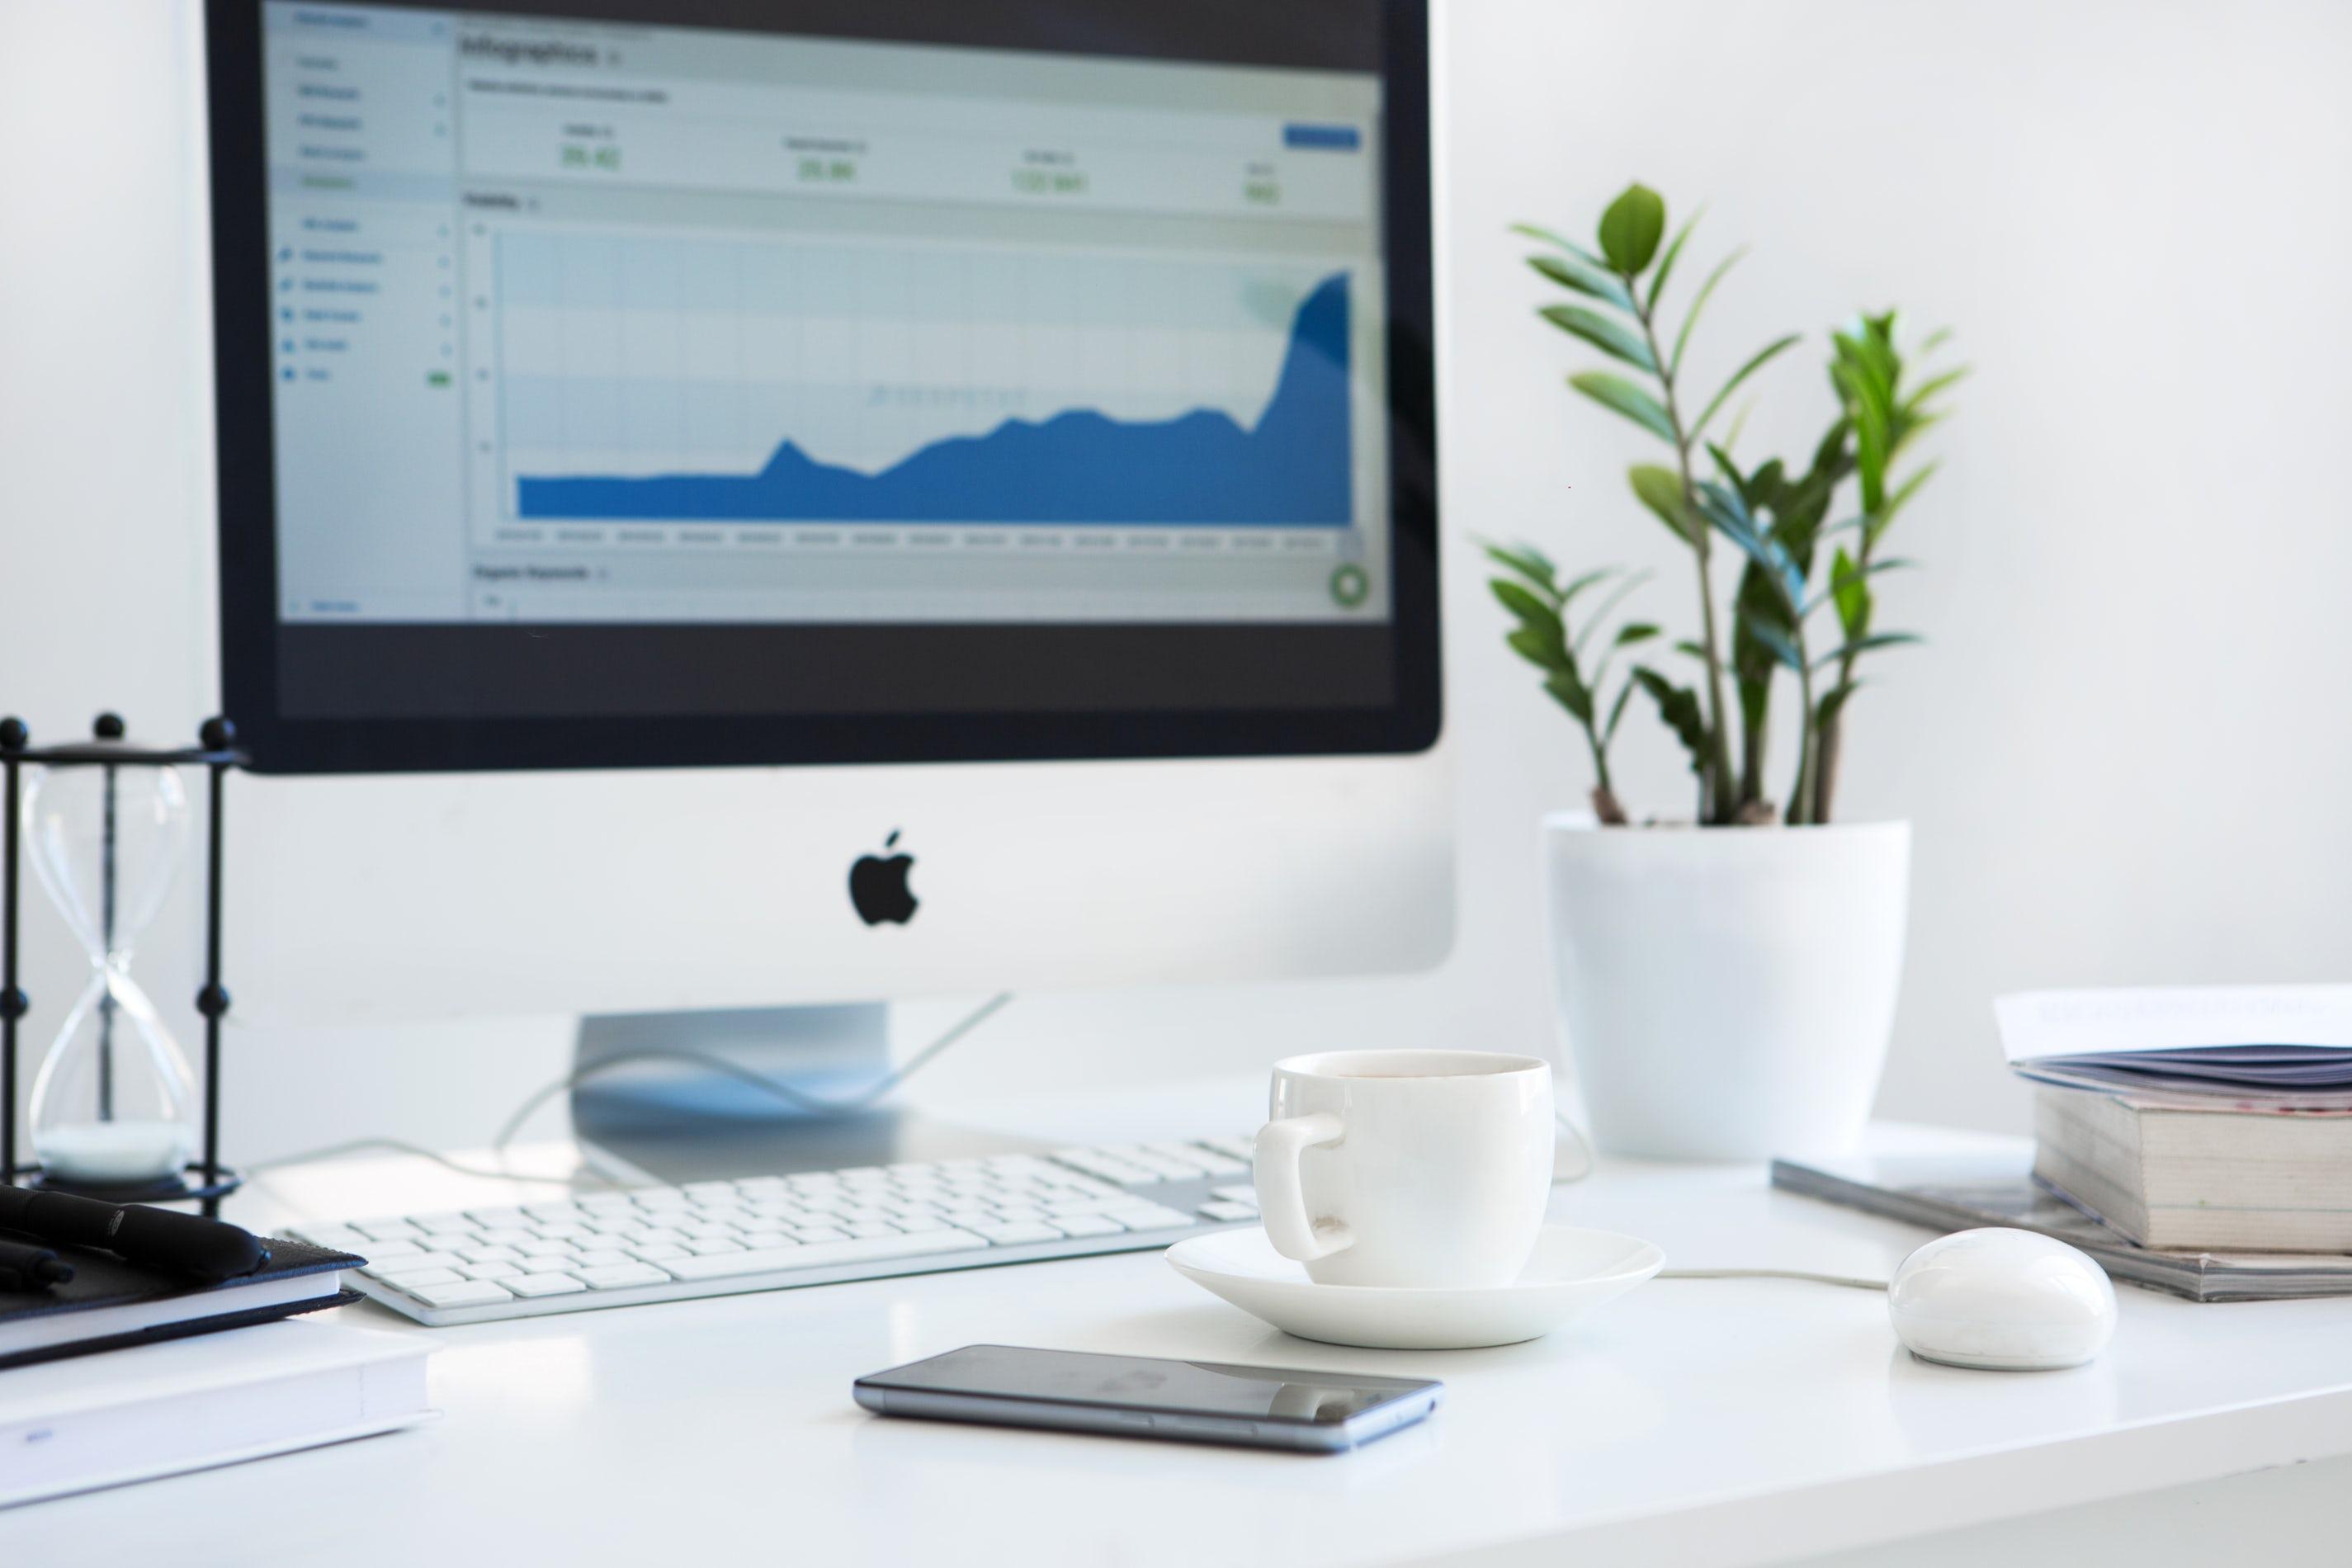 Top 10 Digital Marketing Blogs: SEO, PPC, and Social